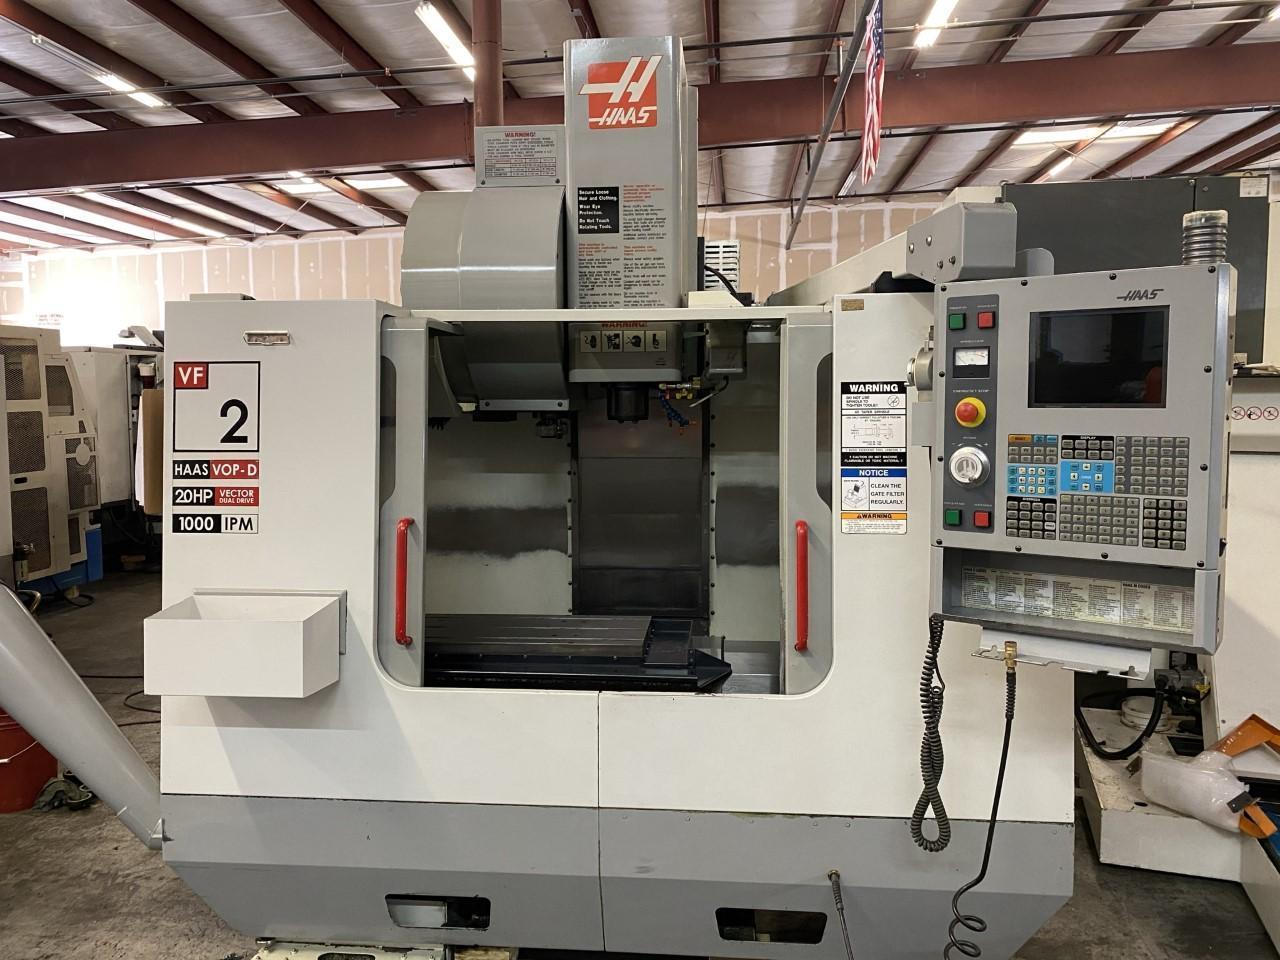 HAAS MODEL #VF-2 CNC VERTICAL MACHINING CENTER: STOCK 14516